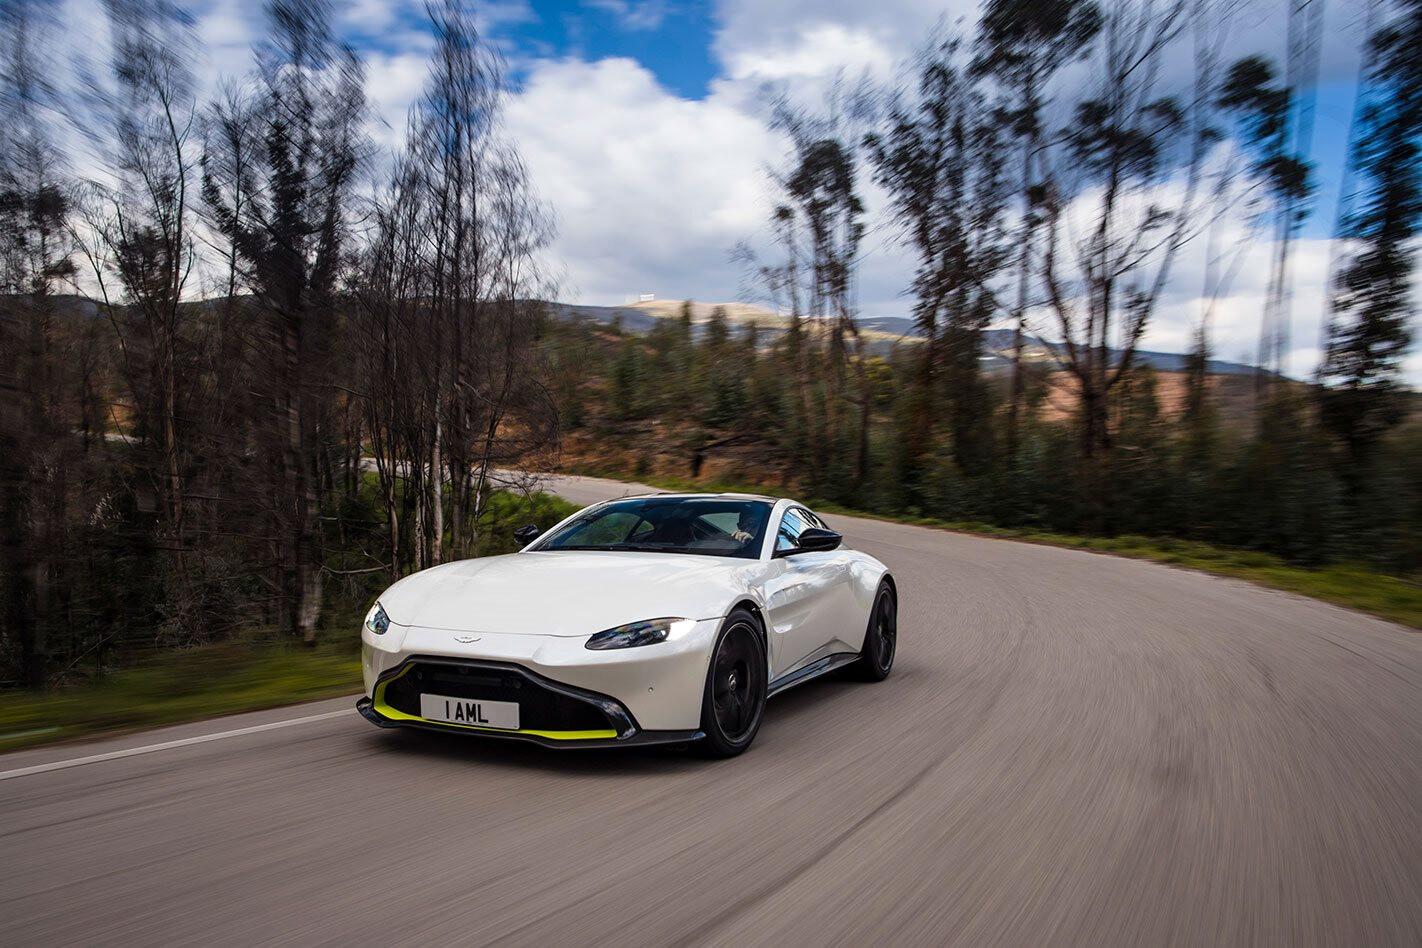 Aston_Martin_V8_Vantage_1_AML__Portugal_10341